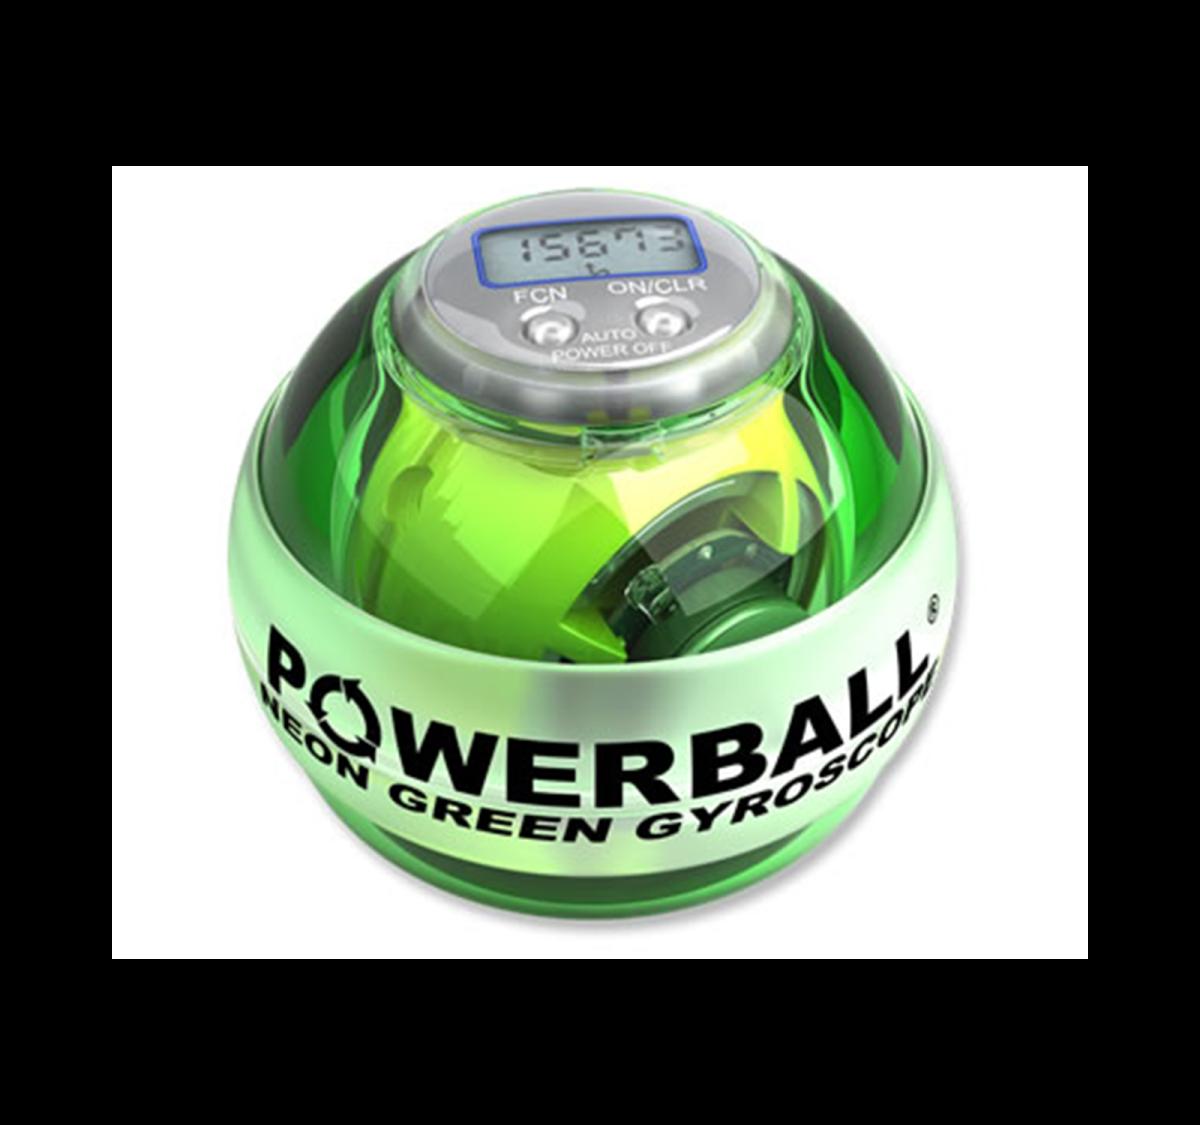 Powerball википедия